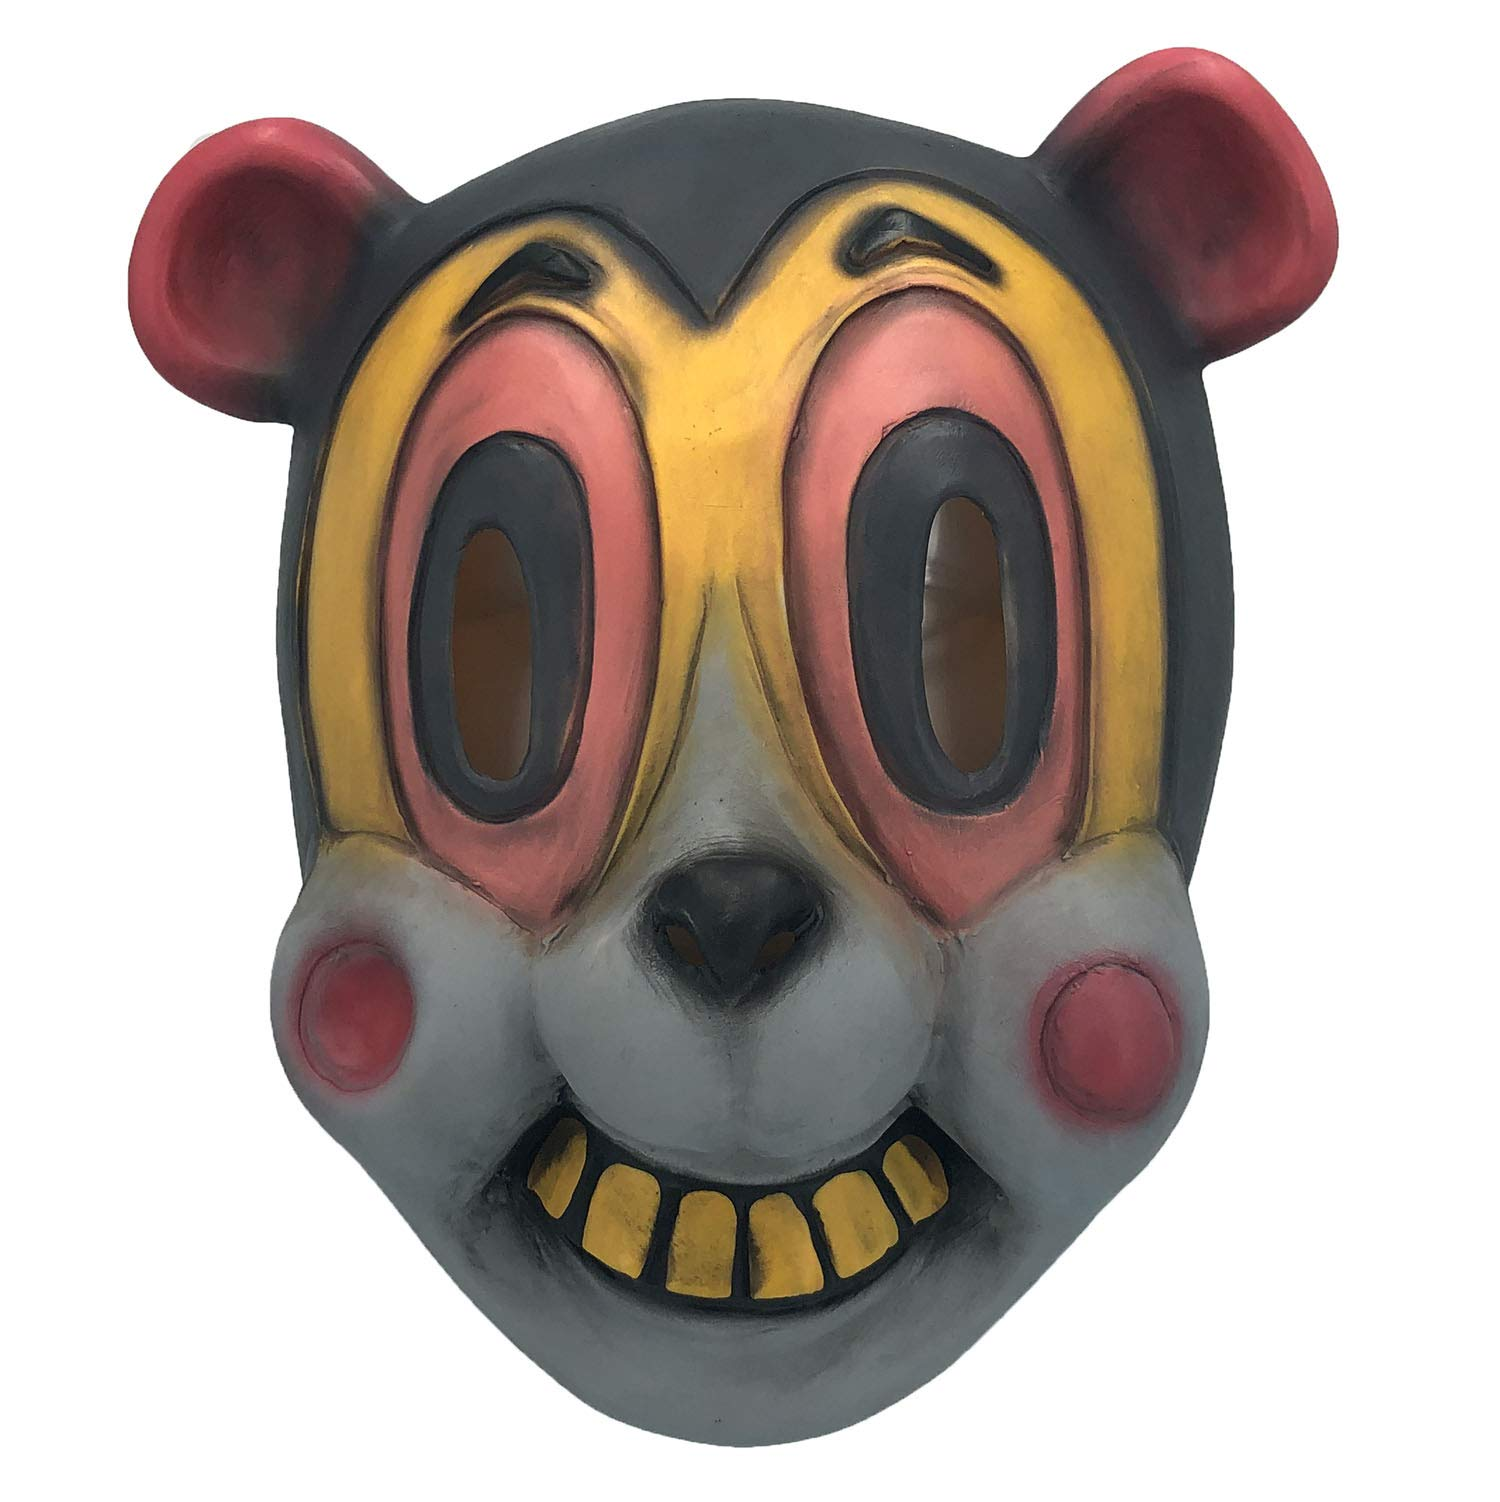 Hazel Latex Mask of The Umbrella Academy, Halloween Cartoonish Cat Masks Animal Helmet, Movies Costume Props